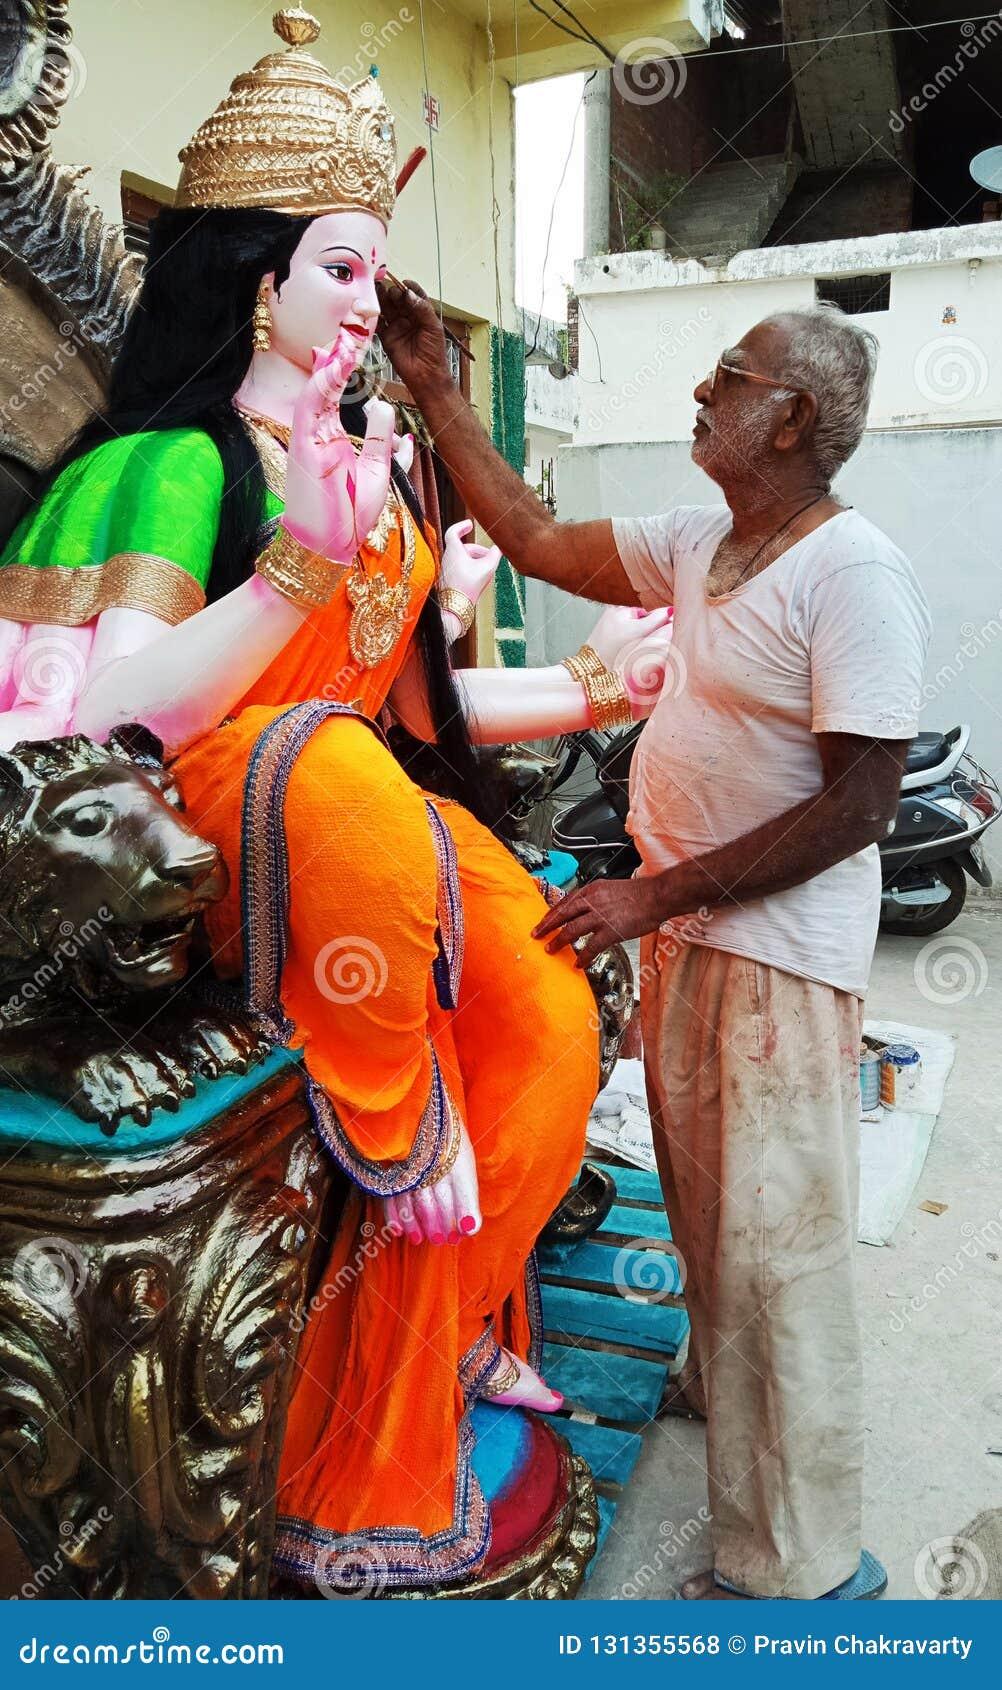 Un artista ha dipinto su una scultura della dea Durga Festival indiano